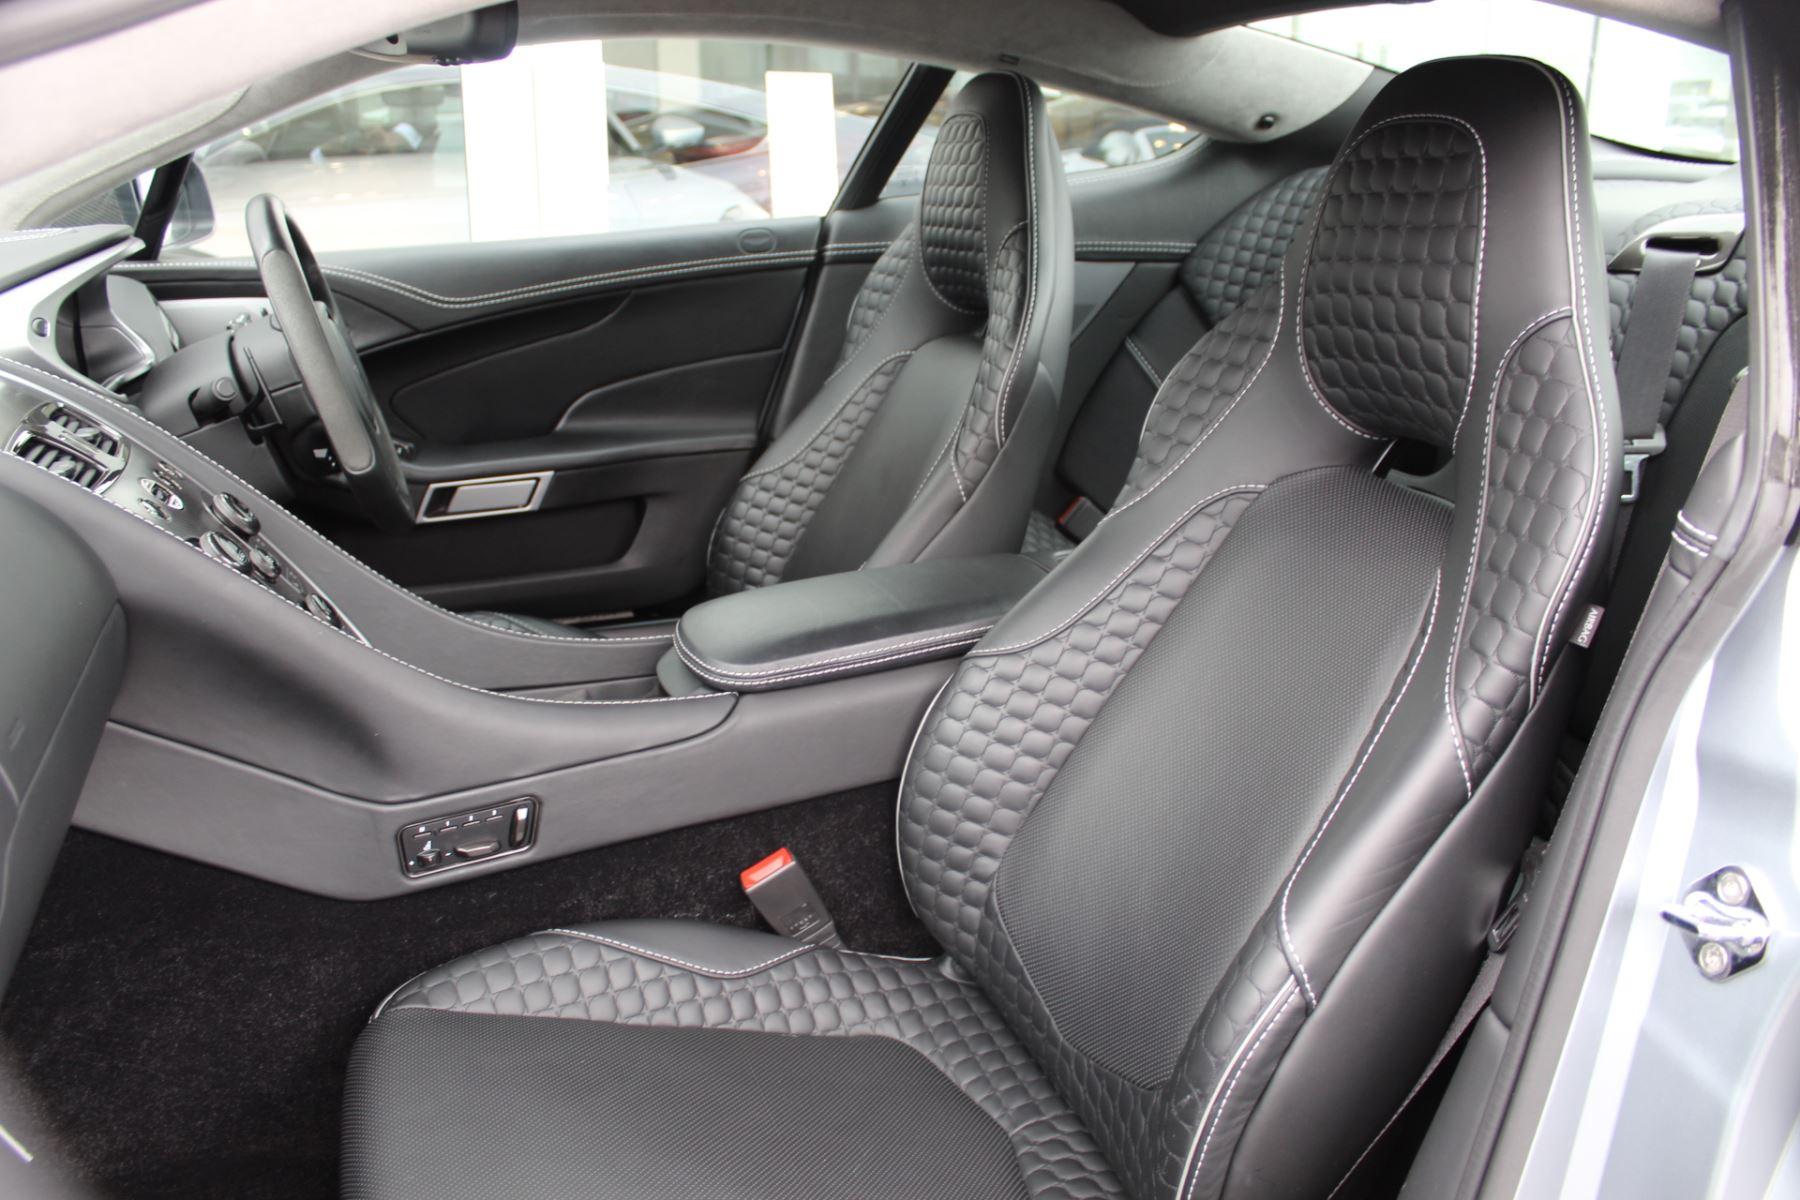 Aston Martin Vanquish V12 2+2 2dr Touchtronic image 5